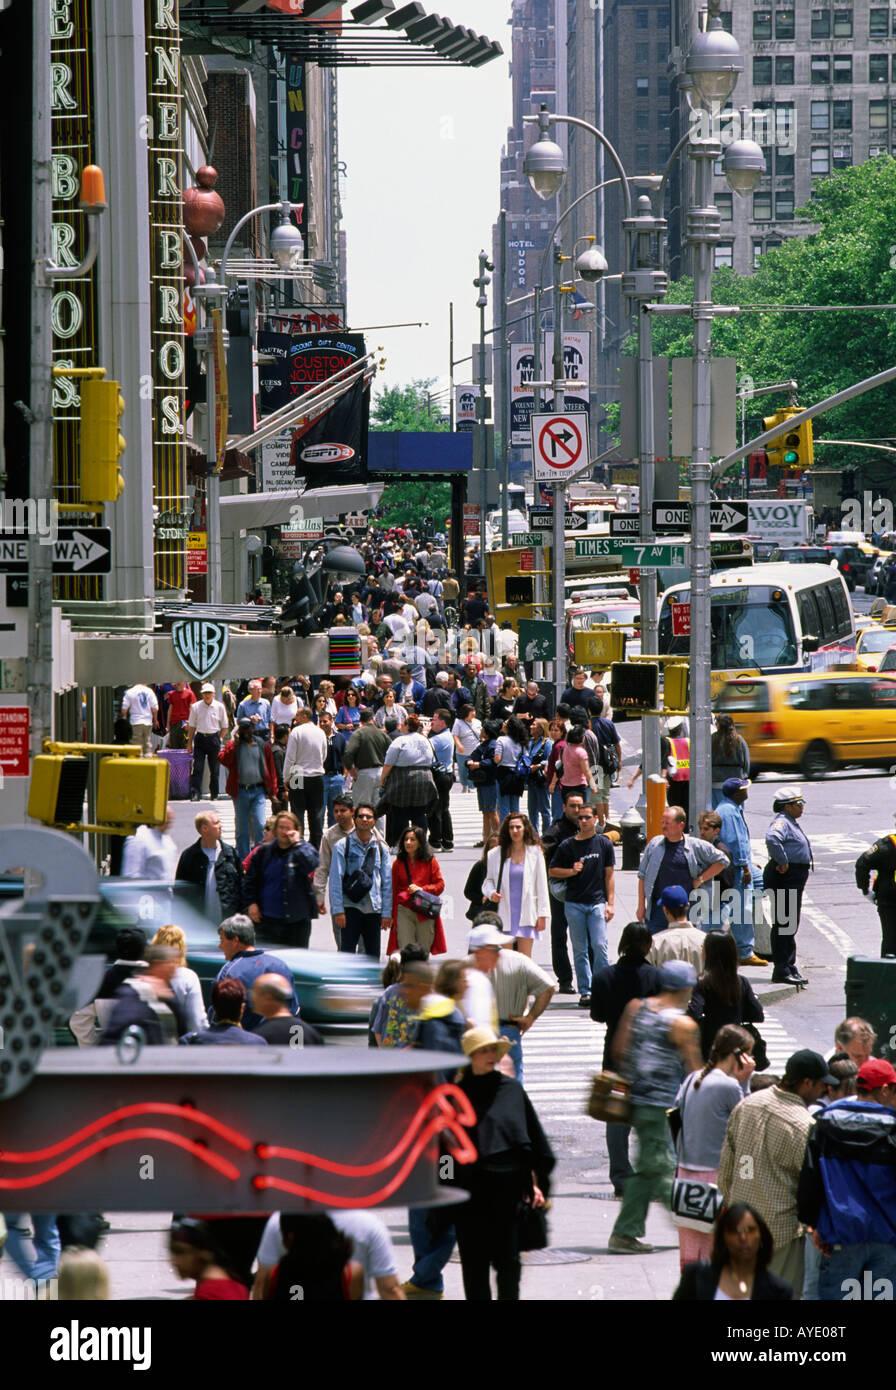 42nd Street, New York City - Stock Image